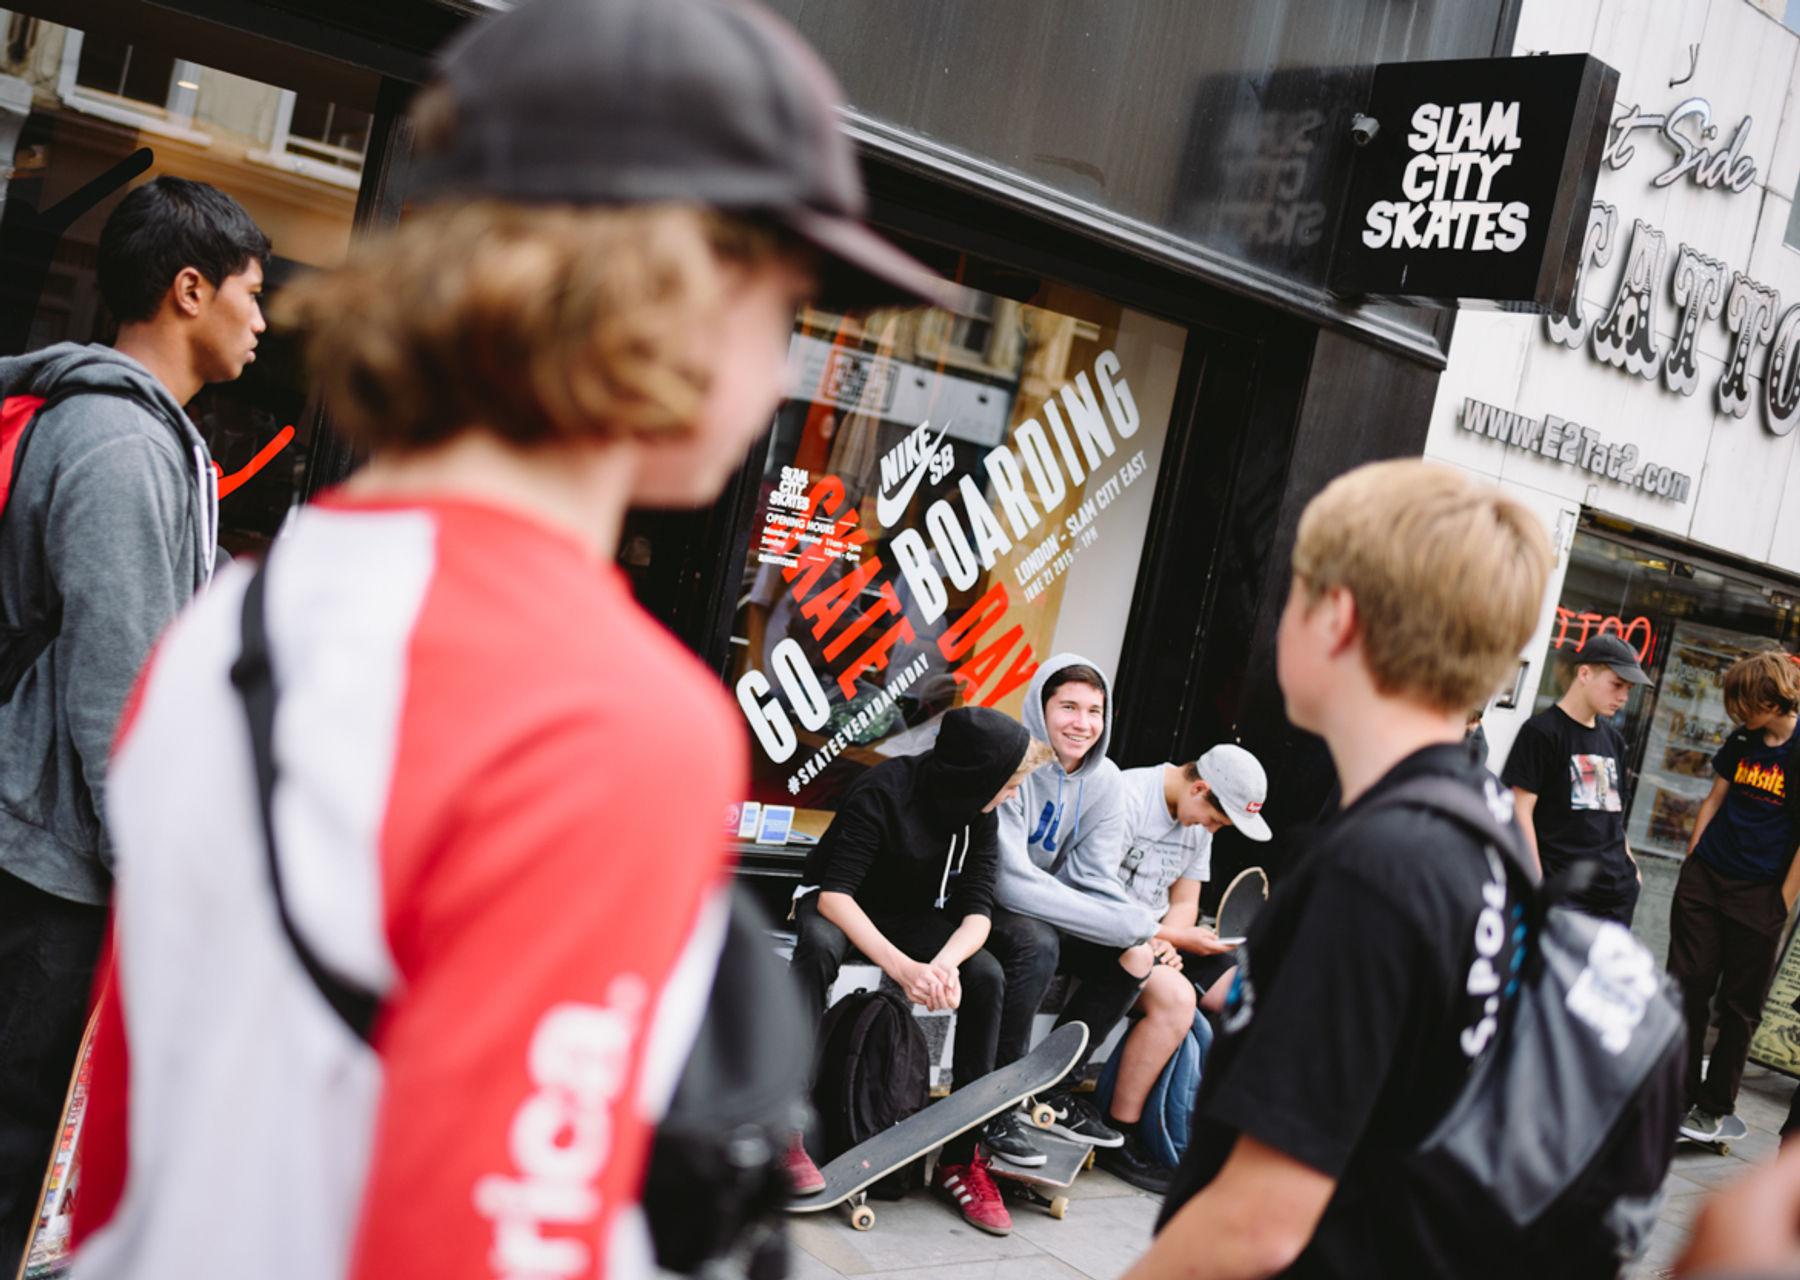 _IHC7118e-Nike-SB-x-Slam-City-Skates-Go-Skateboarding-Day-London-June-2015-Photographer-Maksim-Kalanep